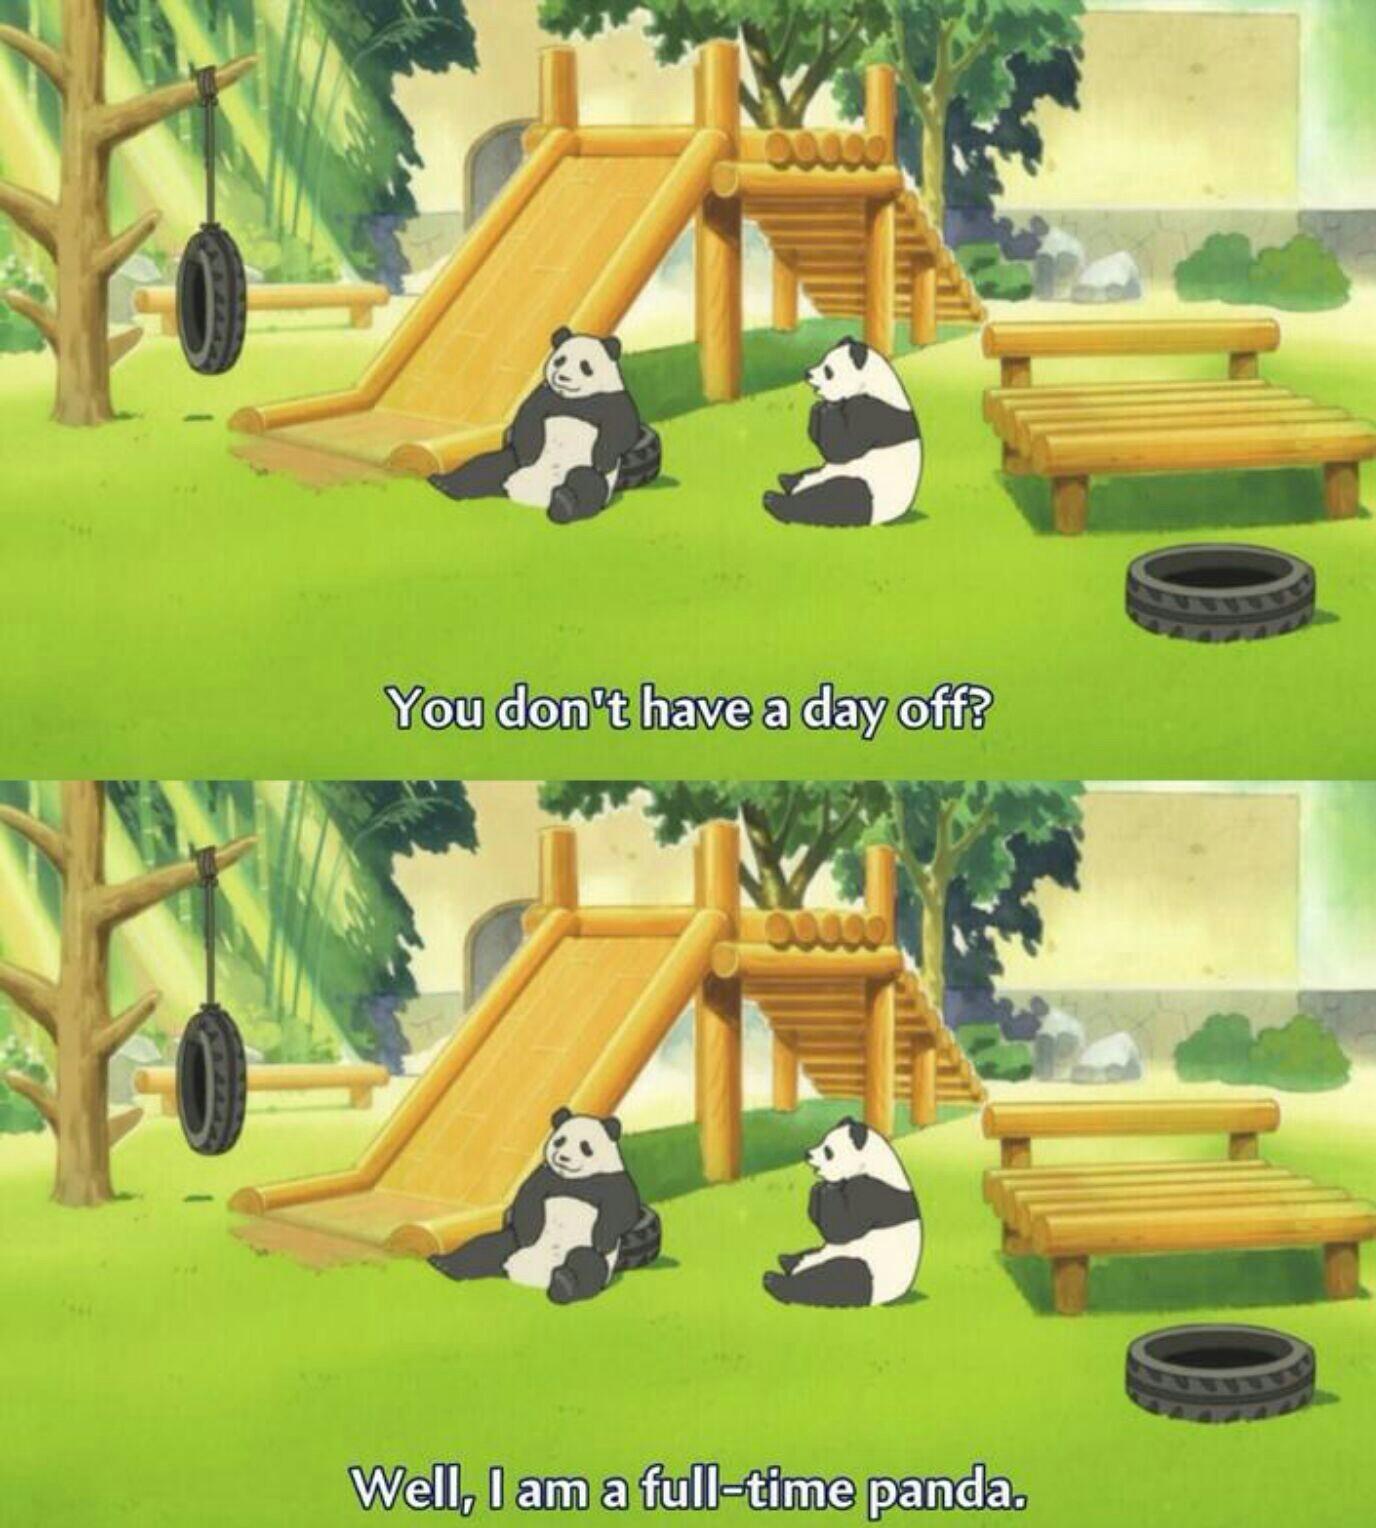 I am only a part time panda - meme